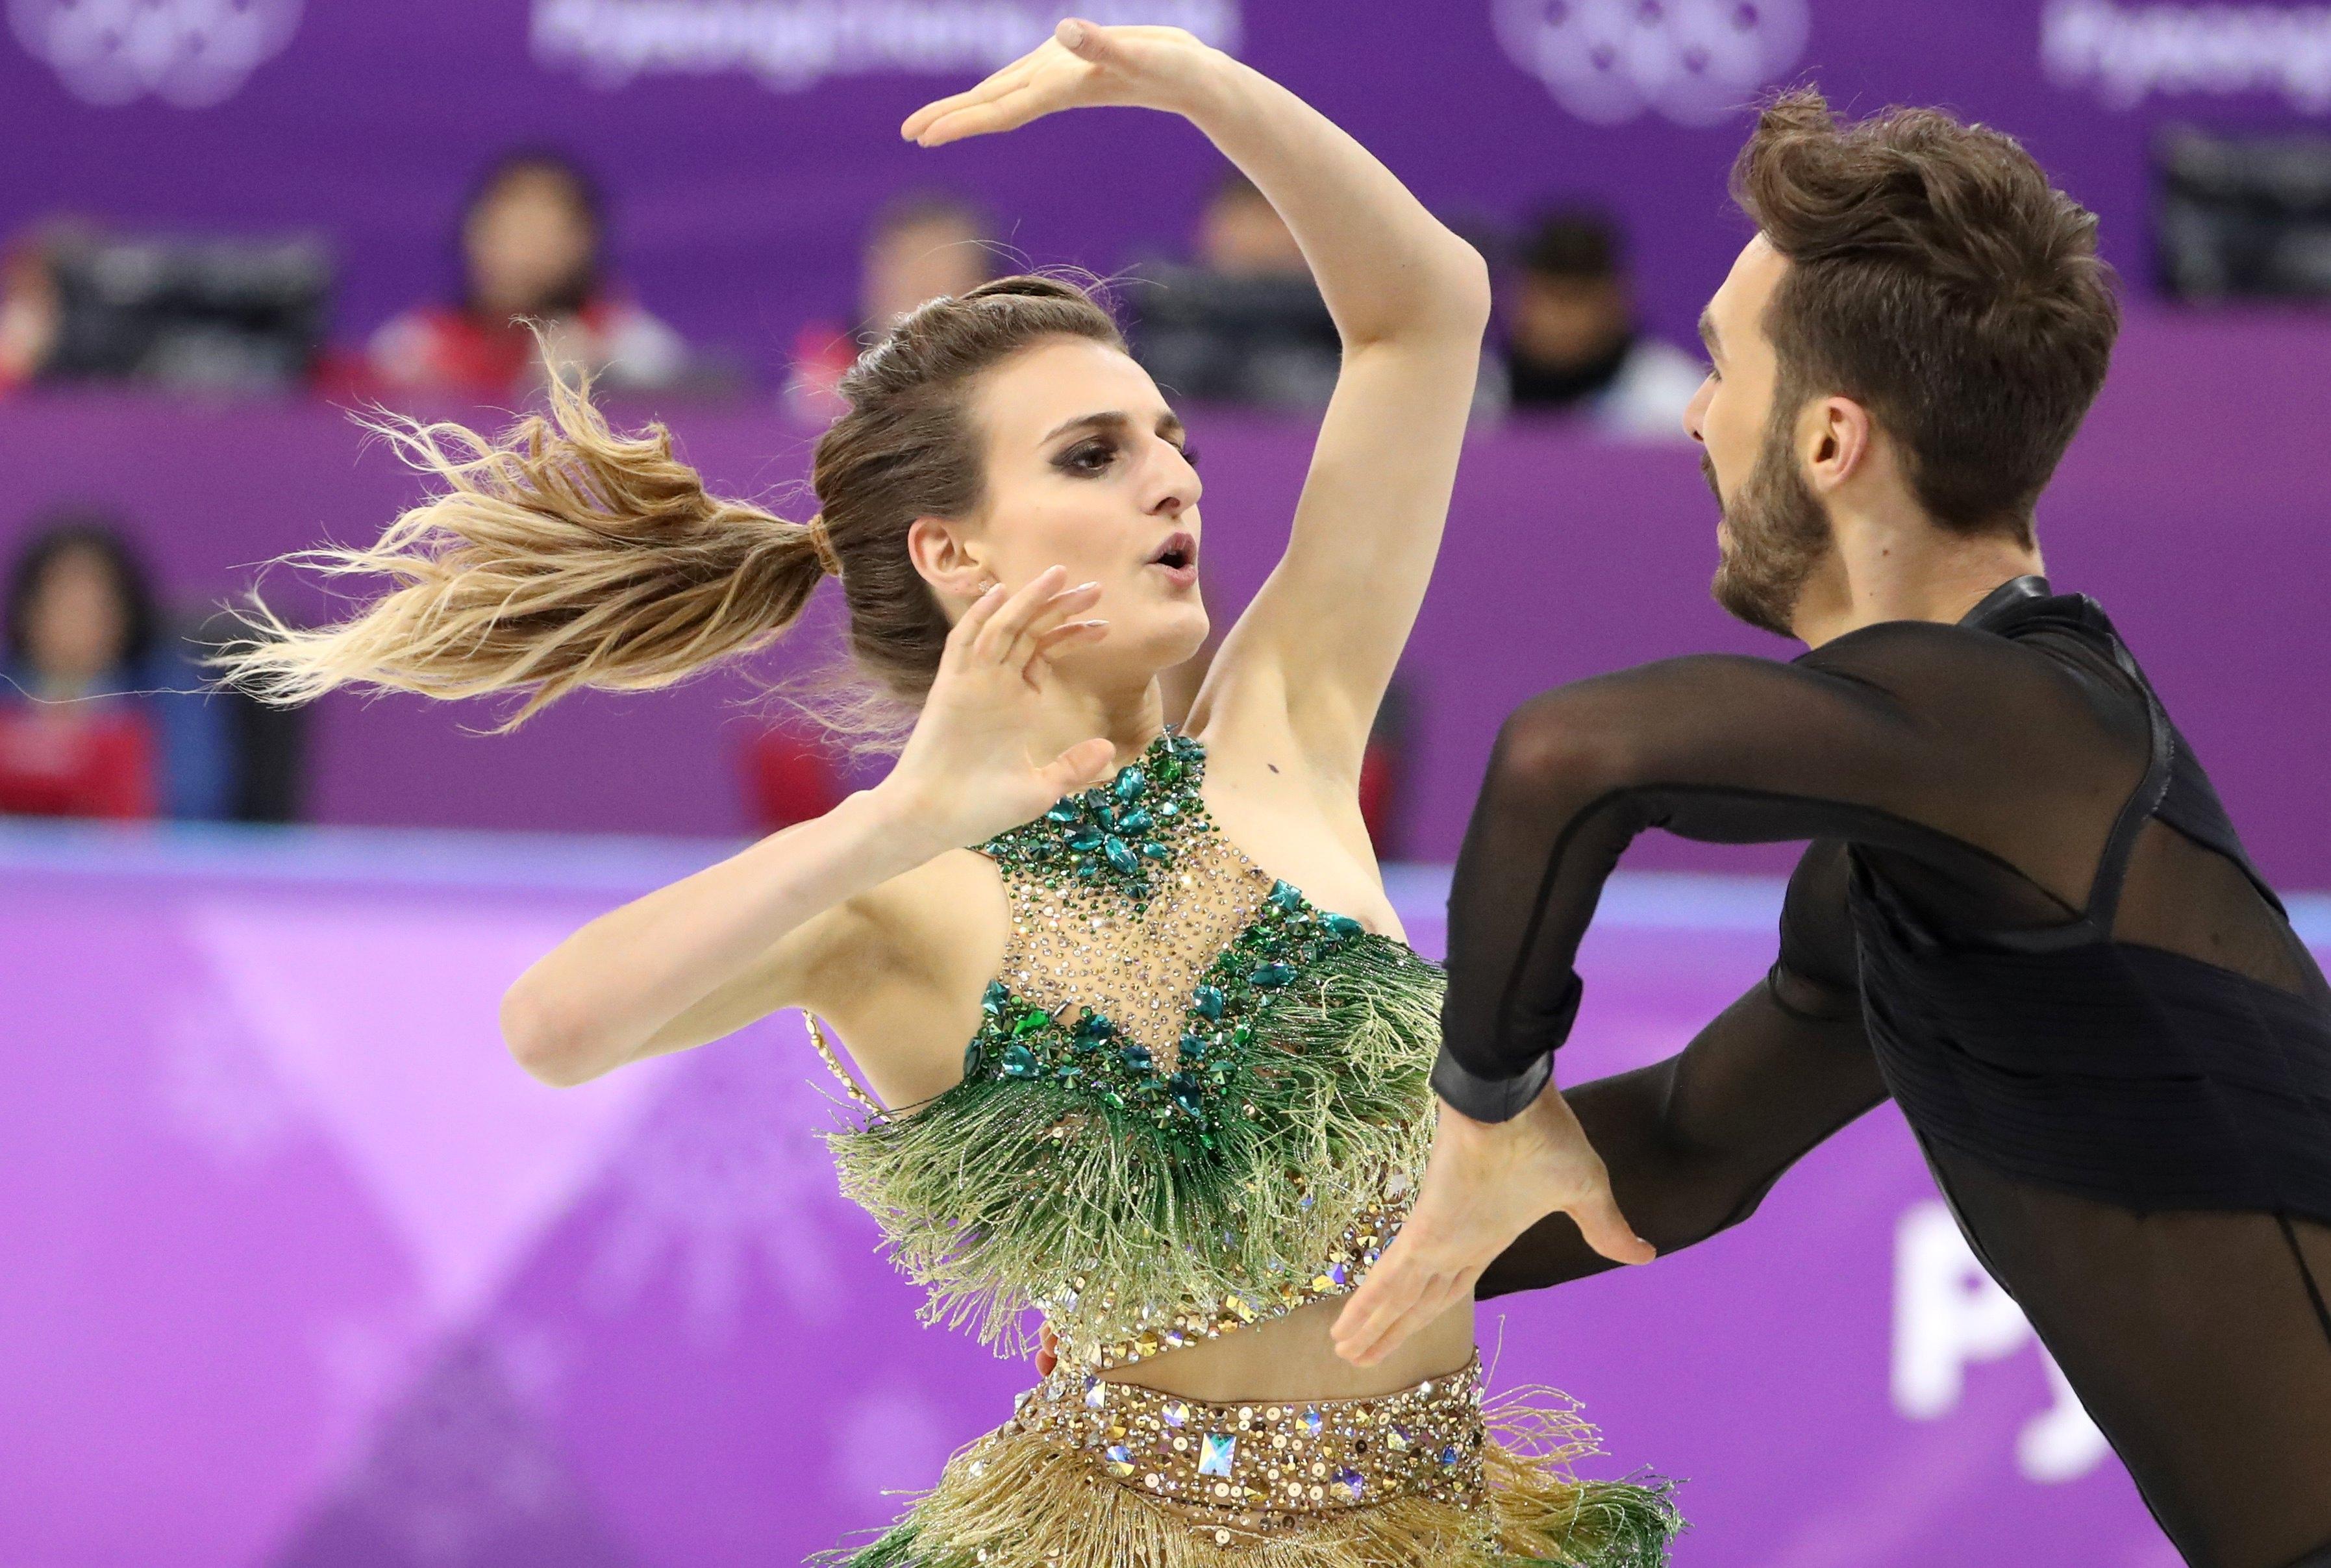 Winter Olympics 2018 Ice Dancer Gabriella Papadakis